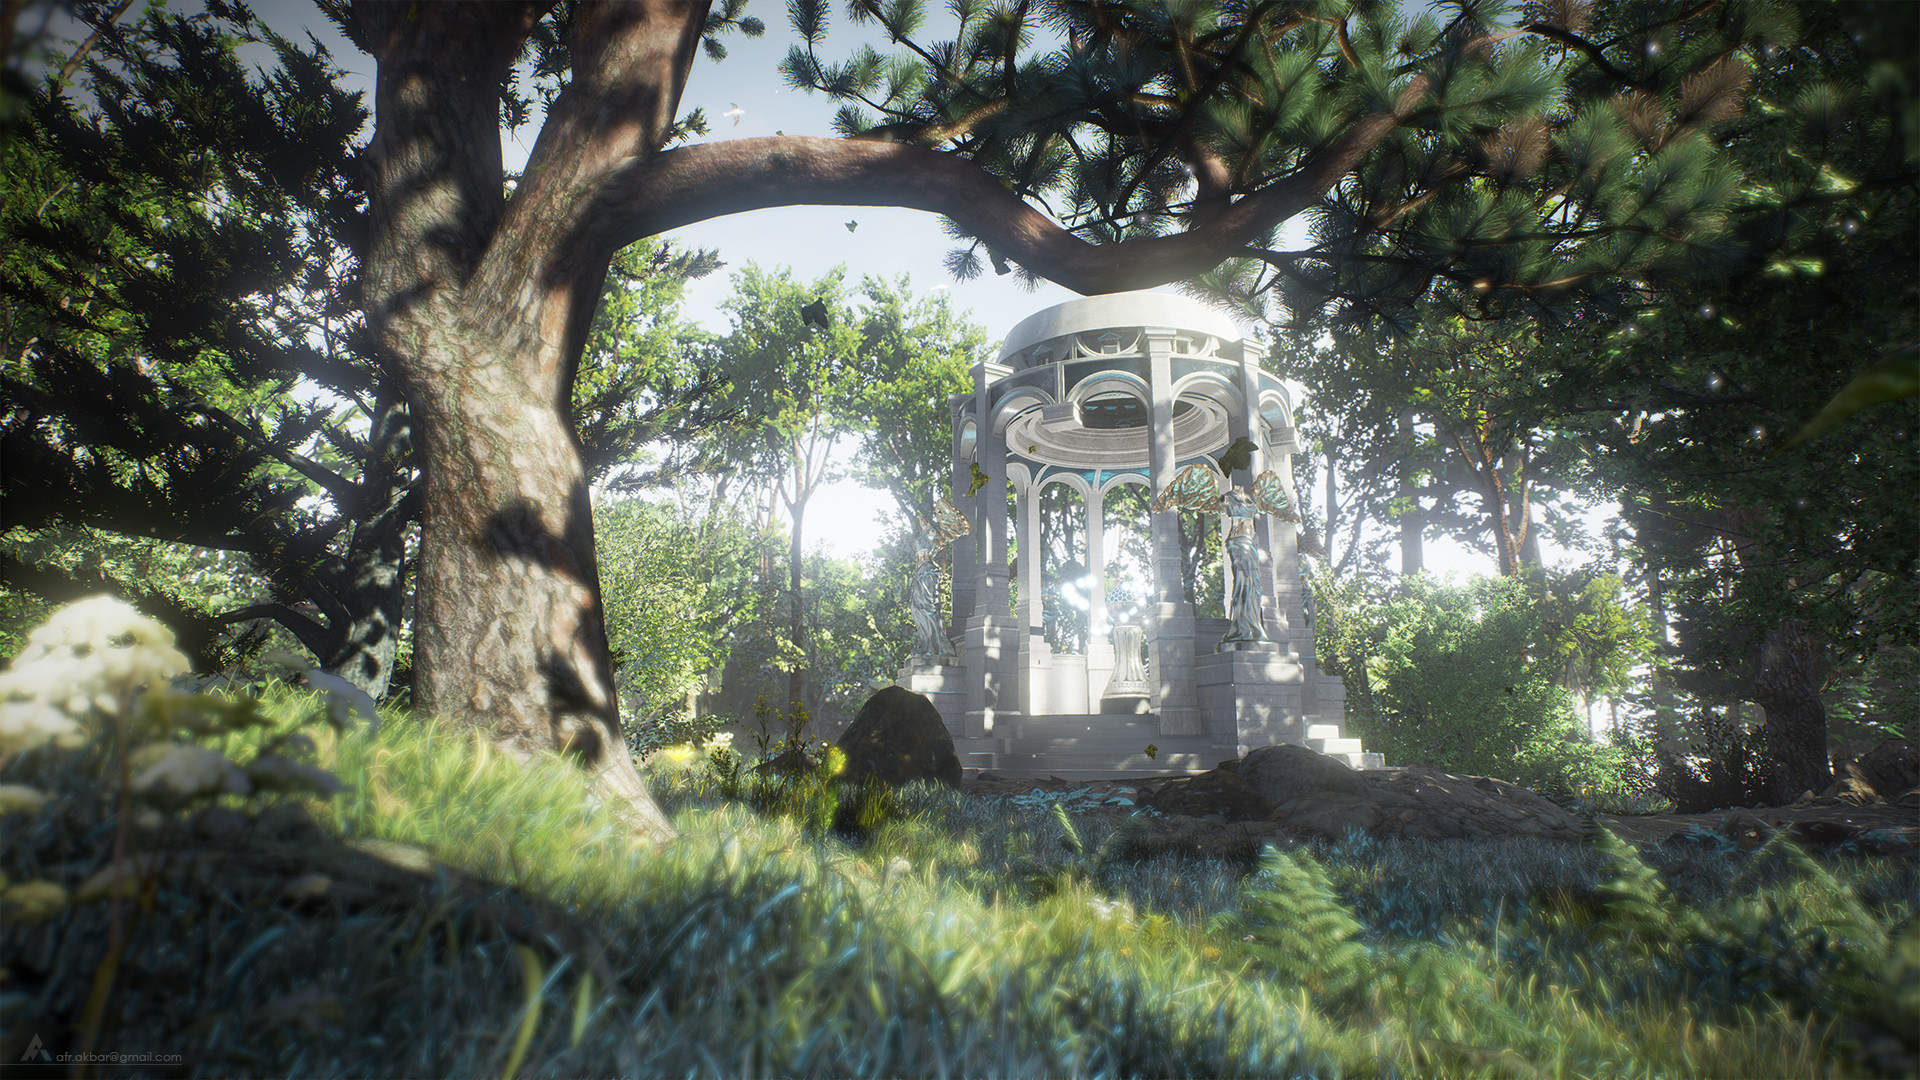 ArtStation - Unreal Engine 4, Realistic Rendering, Afr Akbar